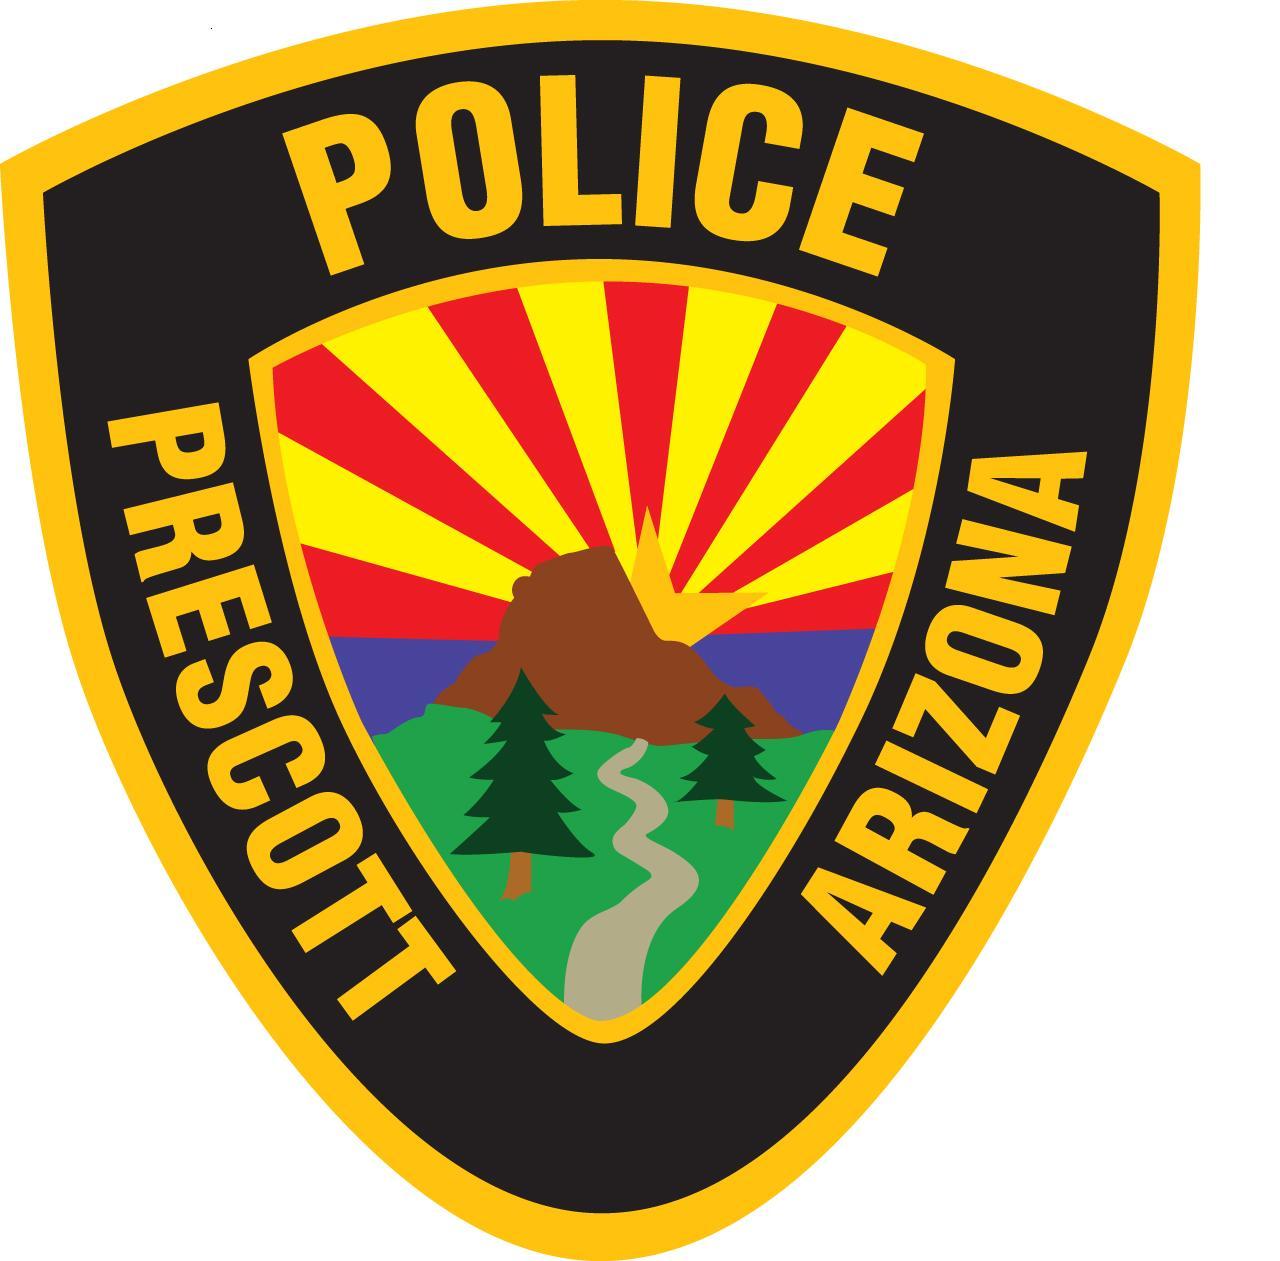 Shean Hilton, Lead Police Officer/PIO, Prescott Police Department